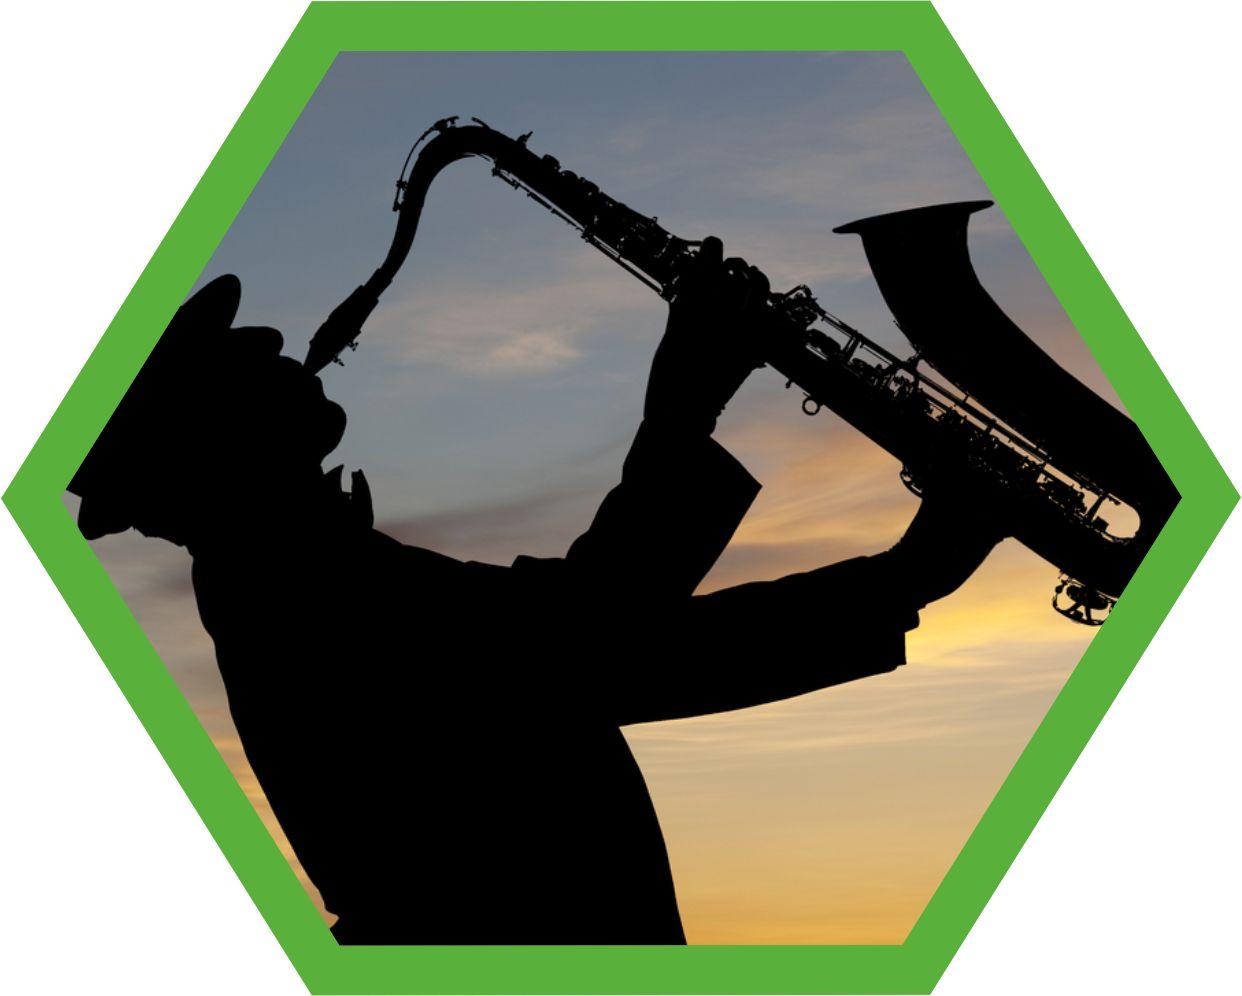 saxophoneCard_Puzzard_AugmentedReality